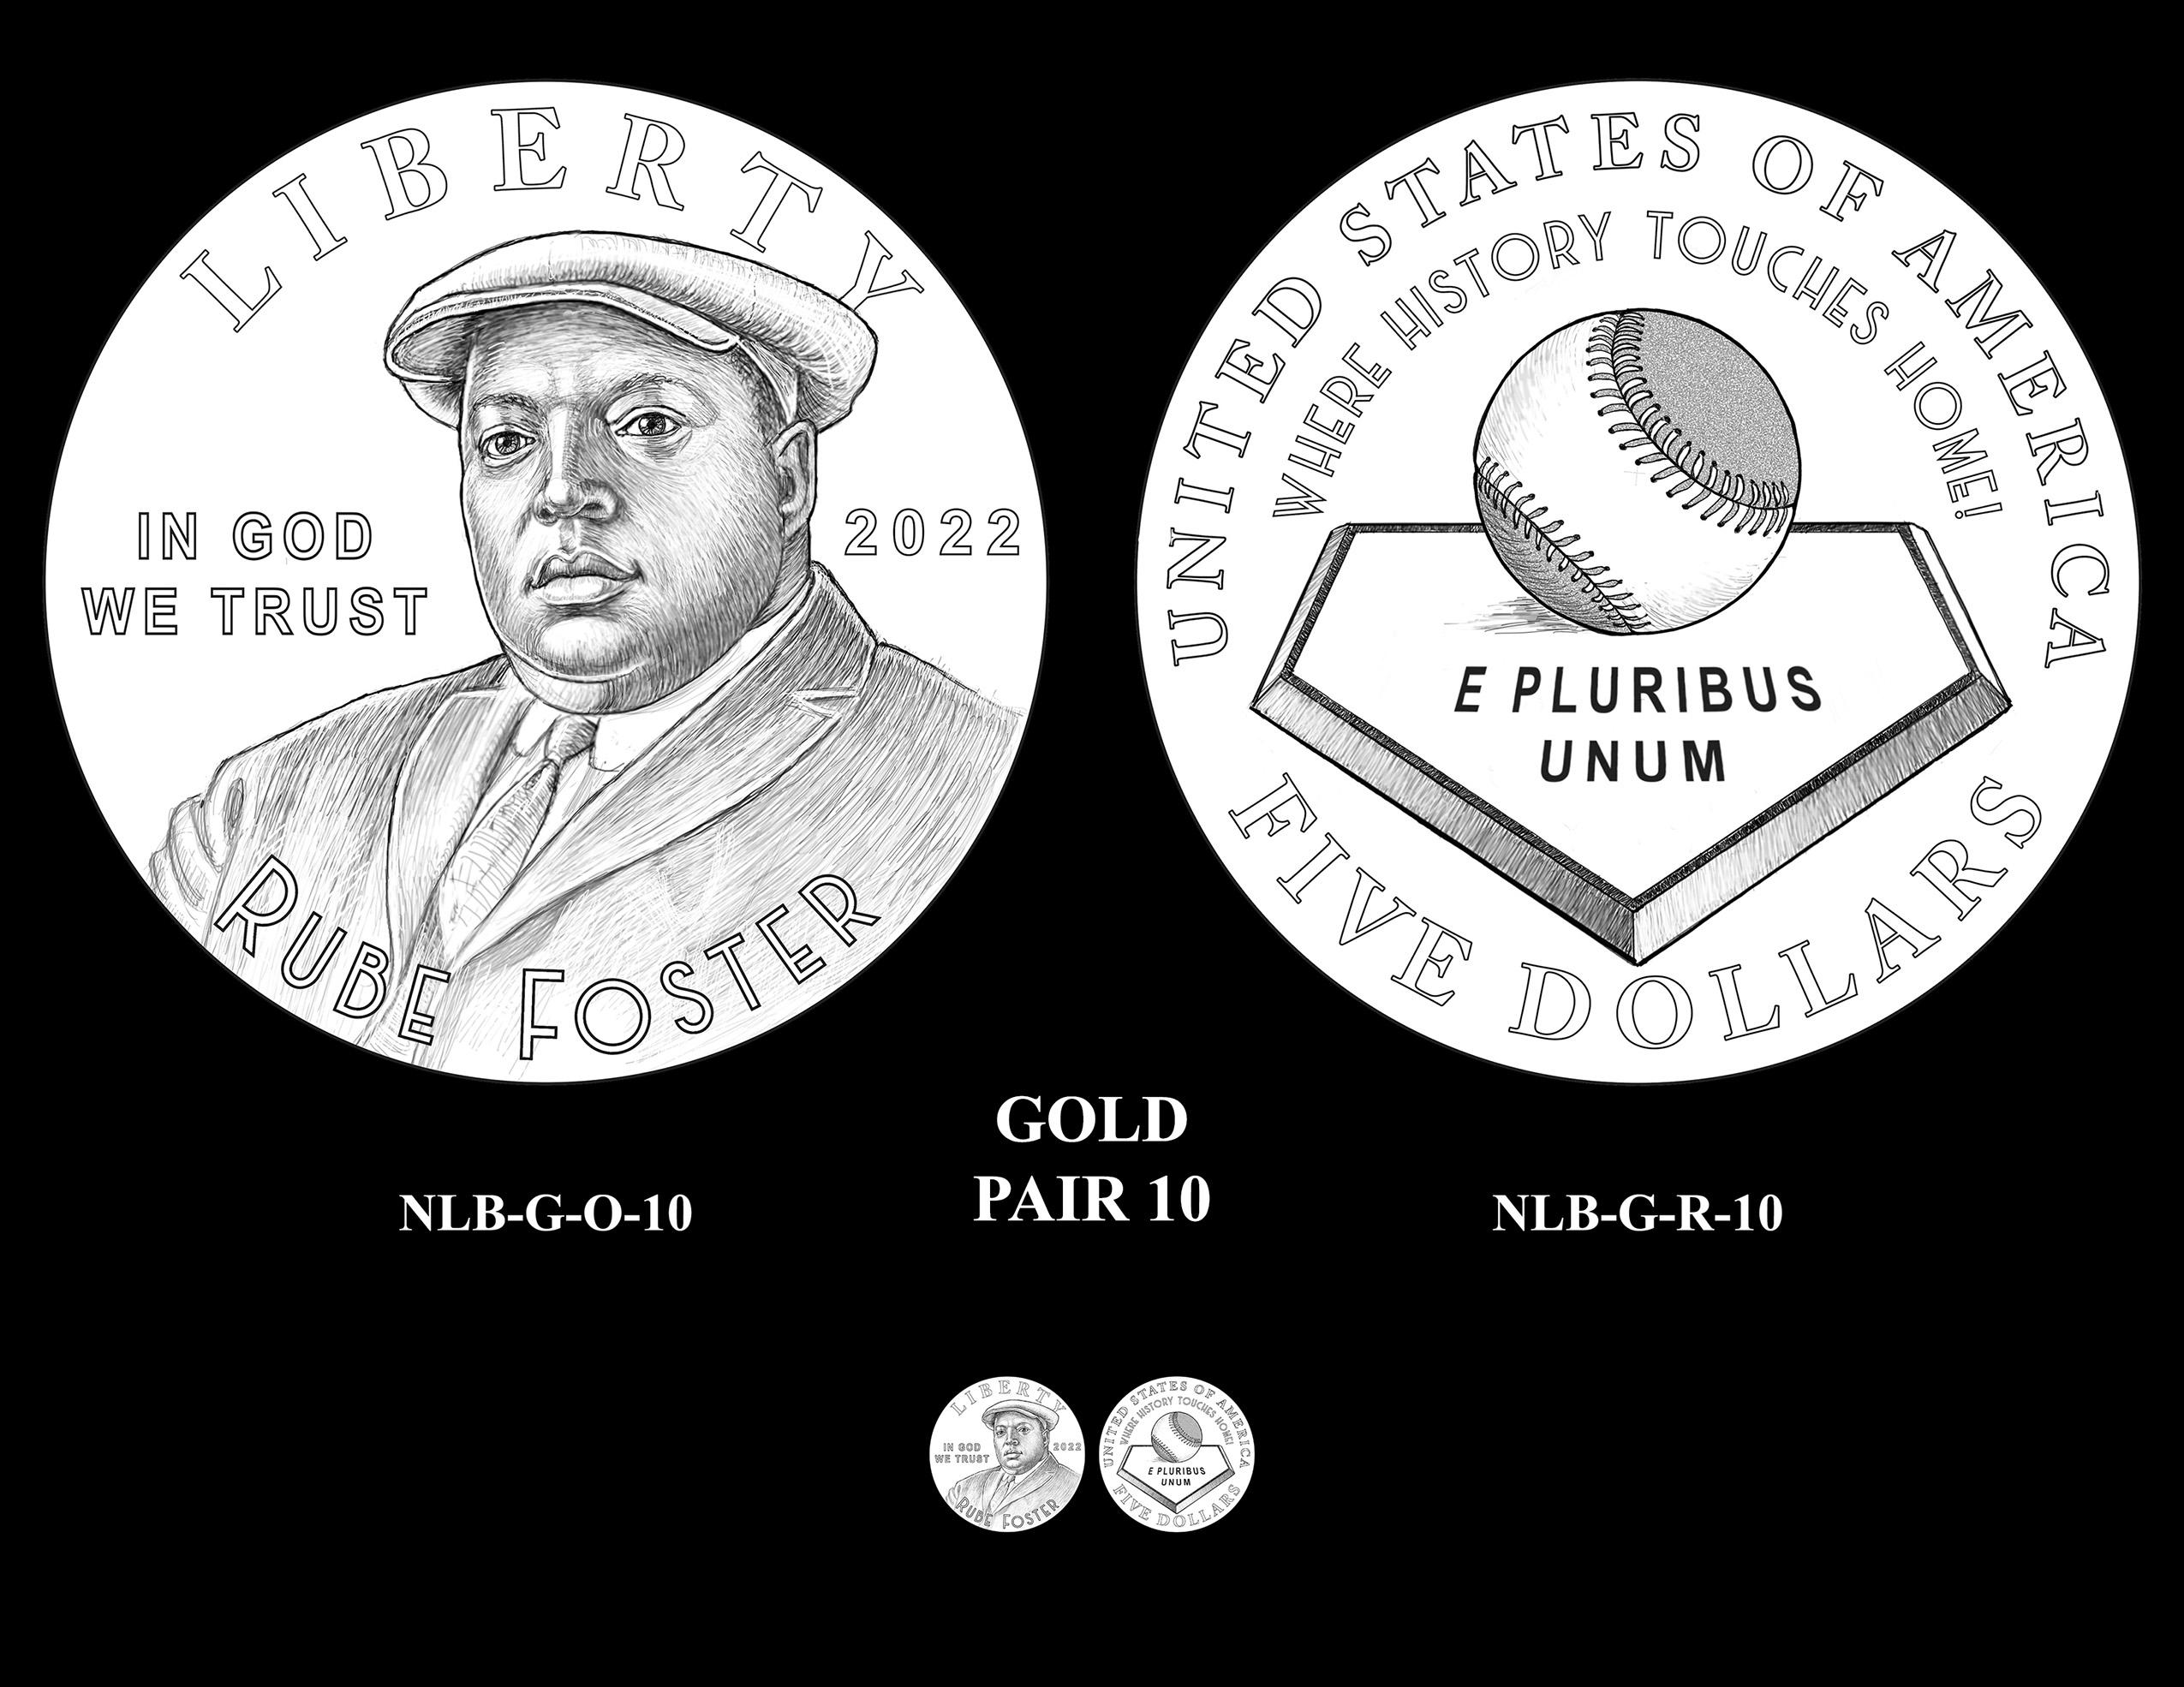 Gold Pair 10 -- Negro Leagues Baseball Commemorative Coin Program